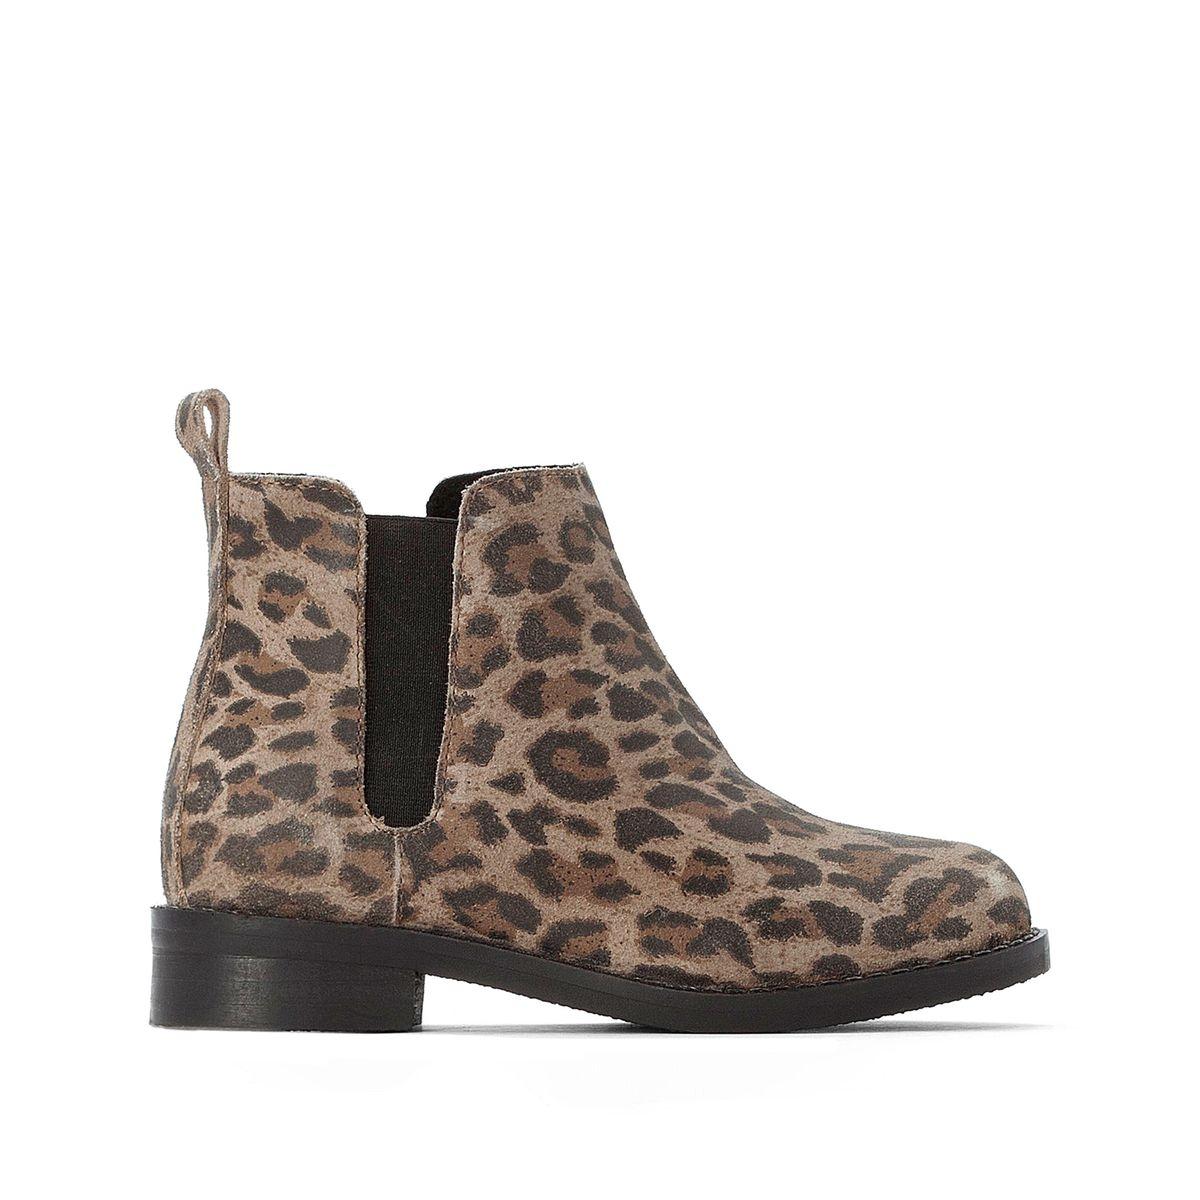 Boots cuir imprimé léopard 26-39